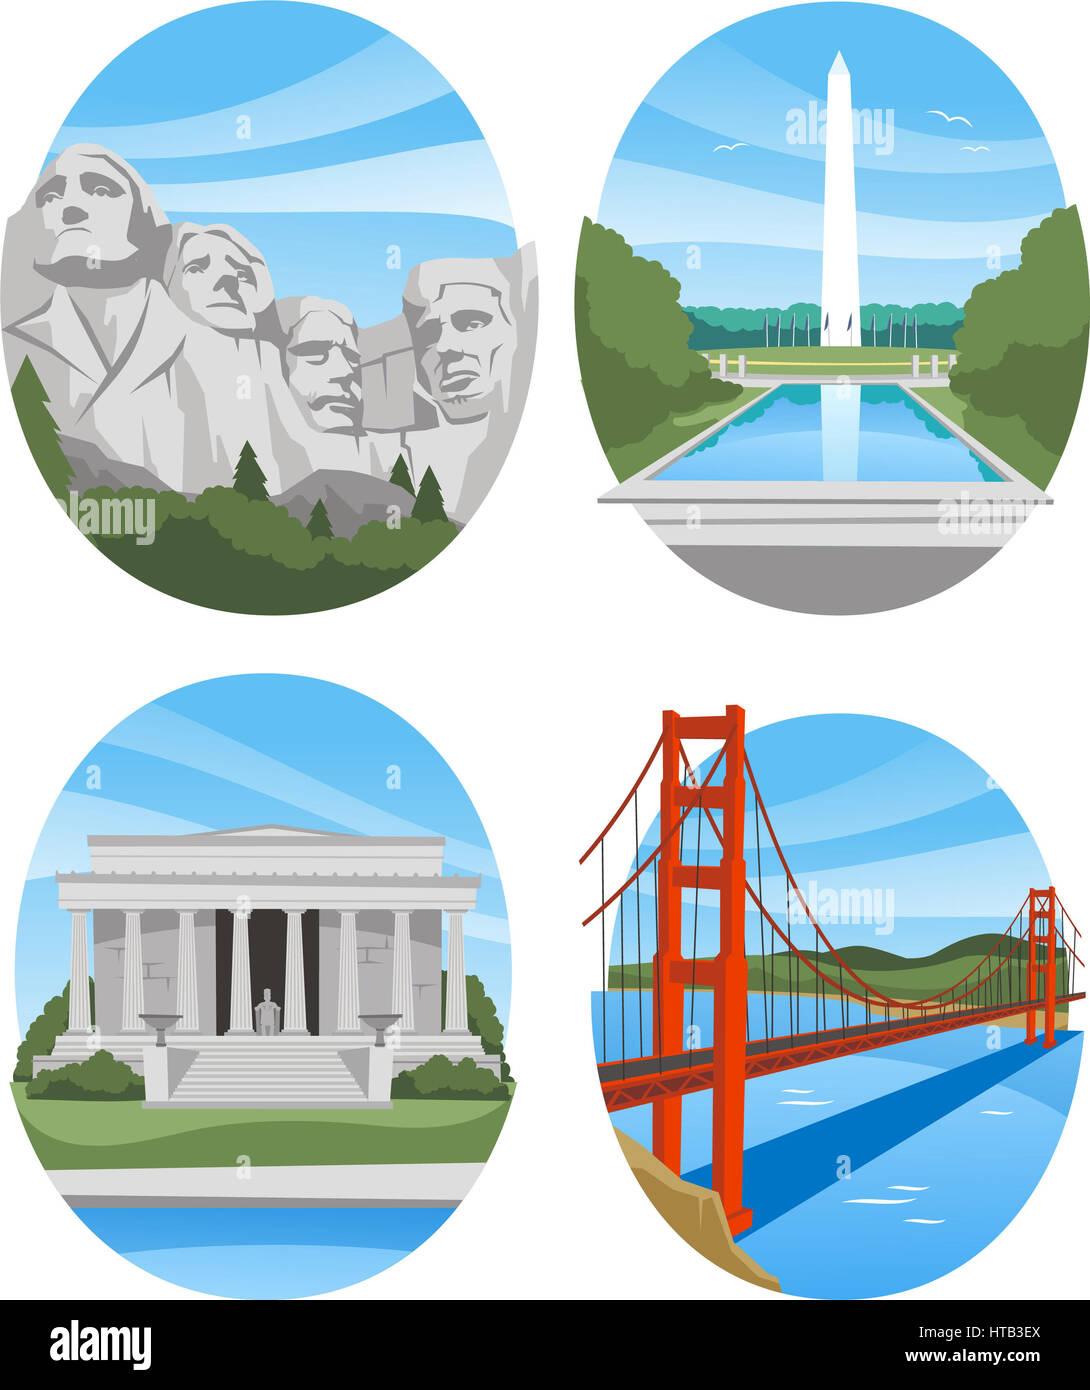 United states landmark buildings - Stock Image